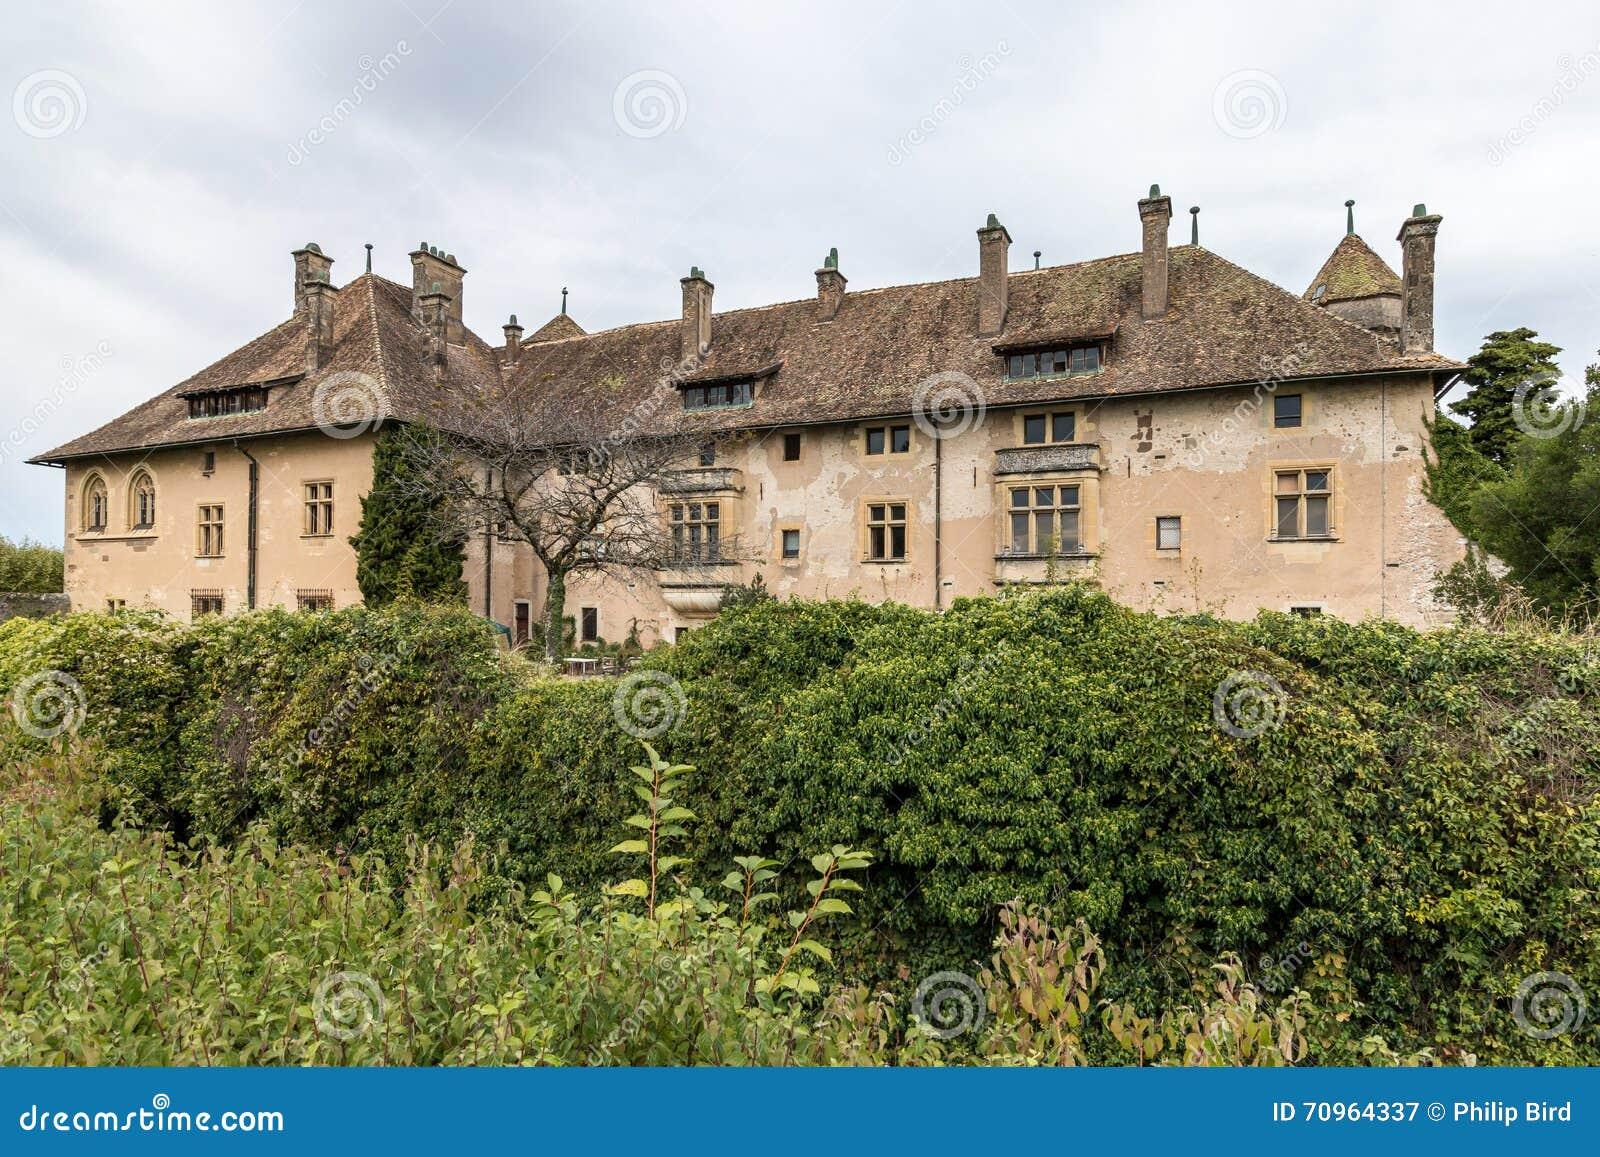 THONON-LES-BAINS FRANKRIJK EUROPA - 15 SEPTEMBER: Chateau DE Ripai